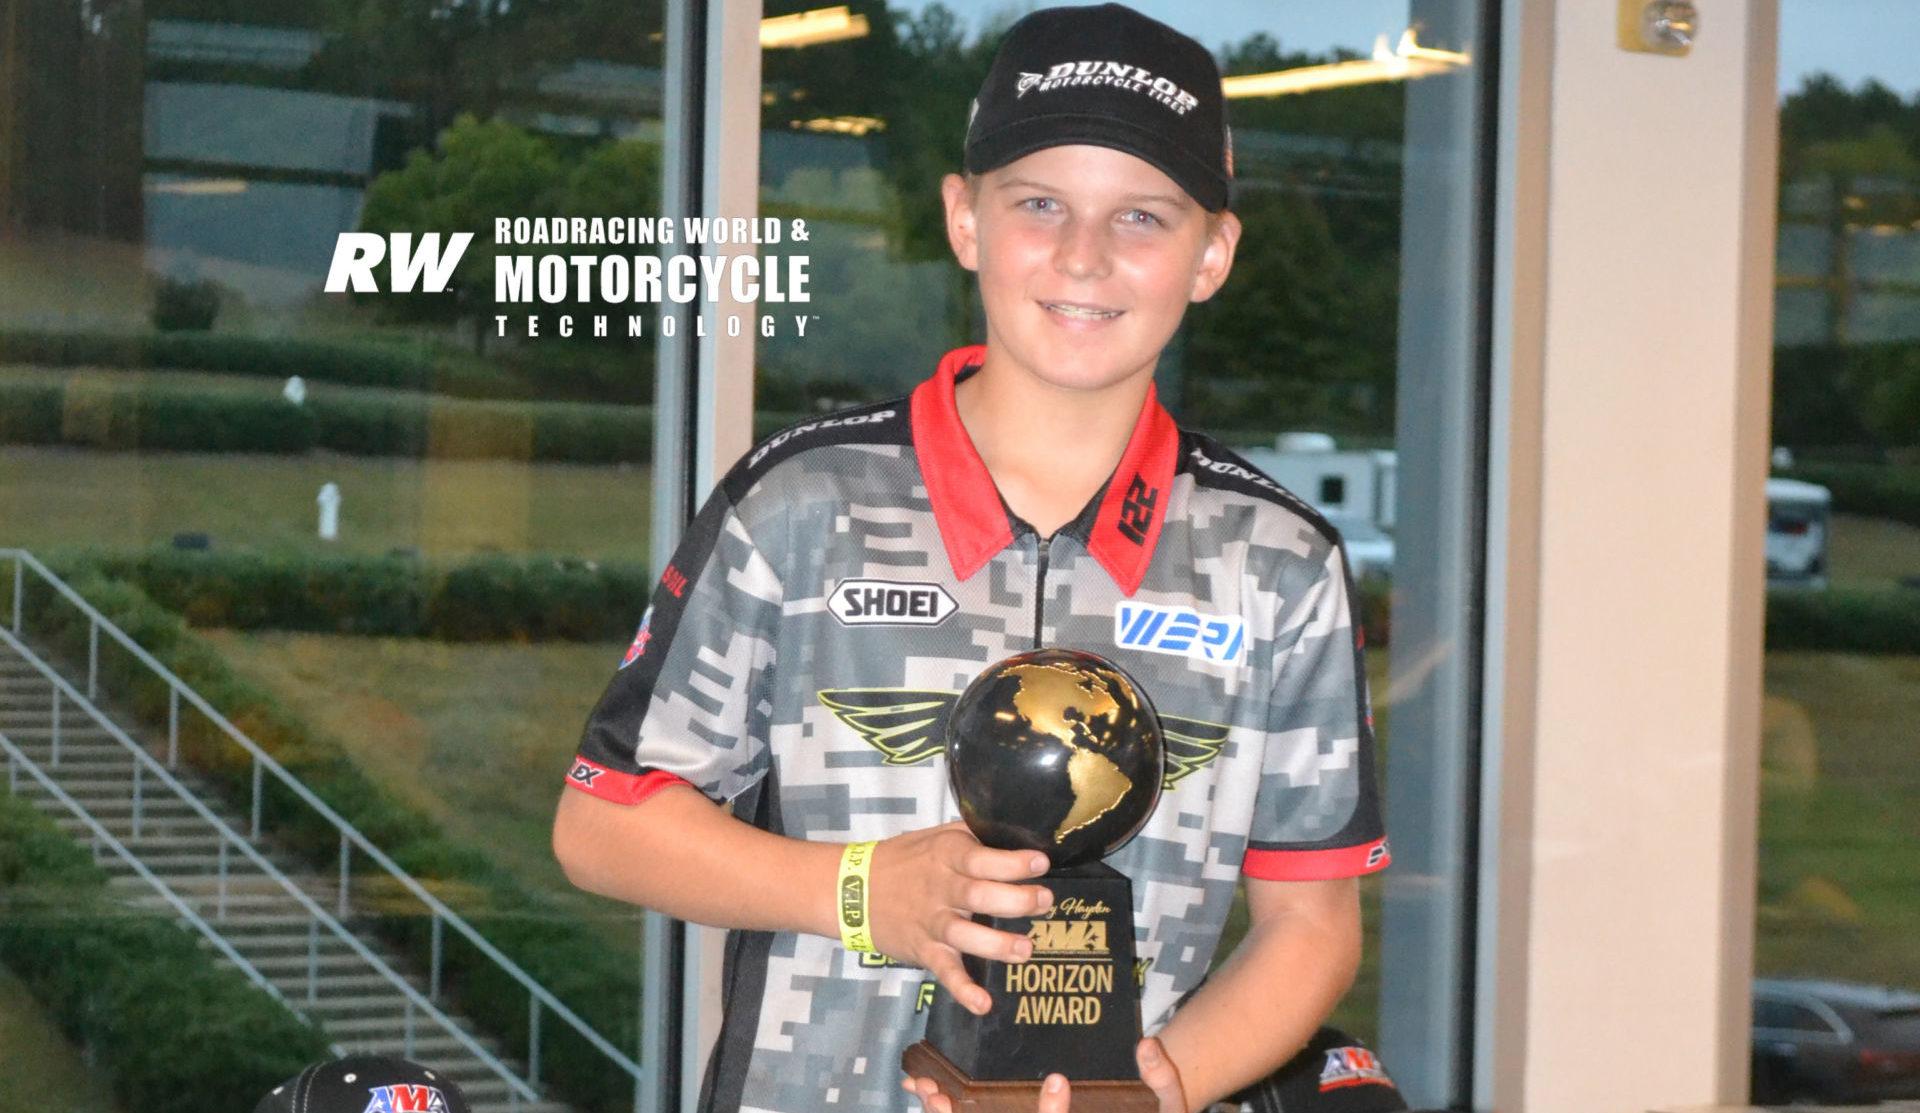 Blake Davis, the 2019 Nicky Hayden AMA Road Race Horizon Award winner. Photo by David Swarts.